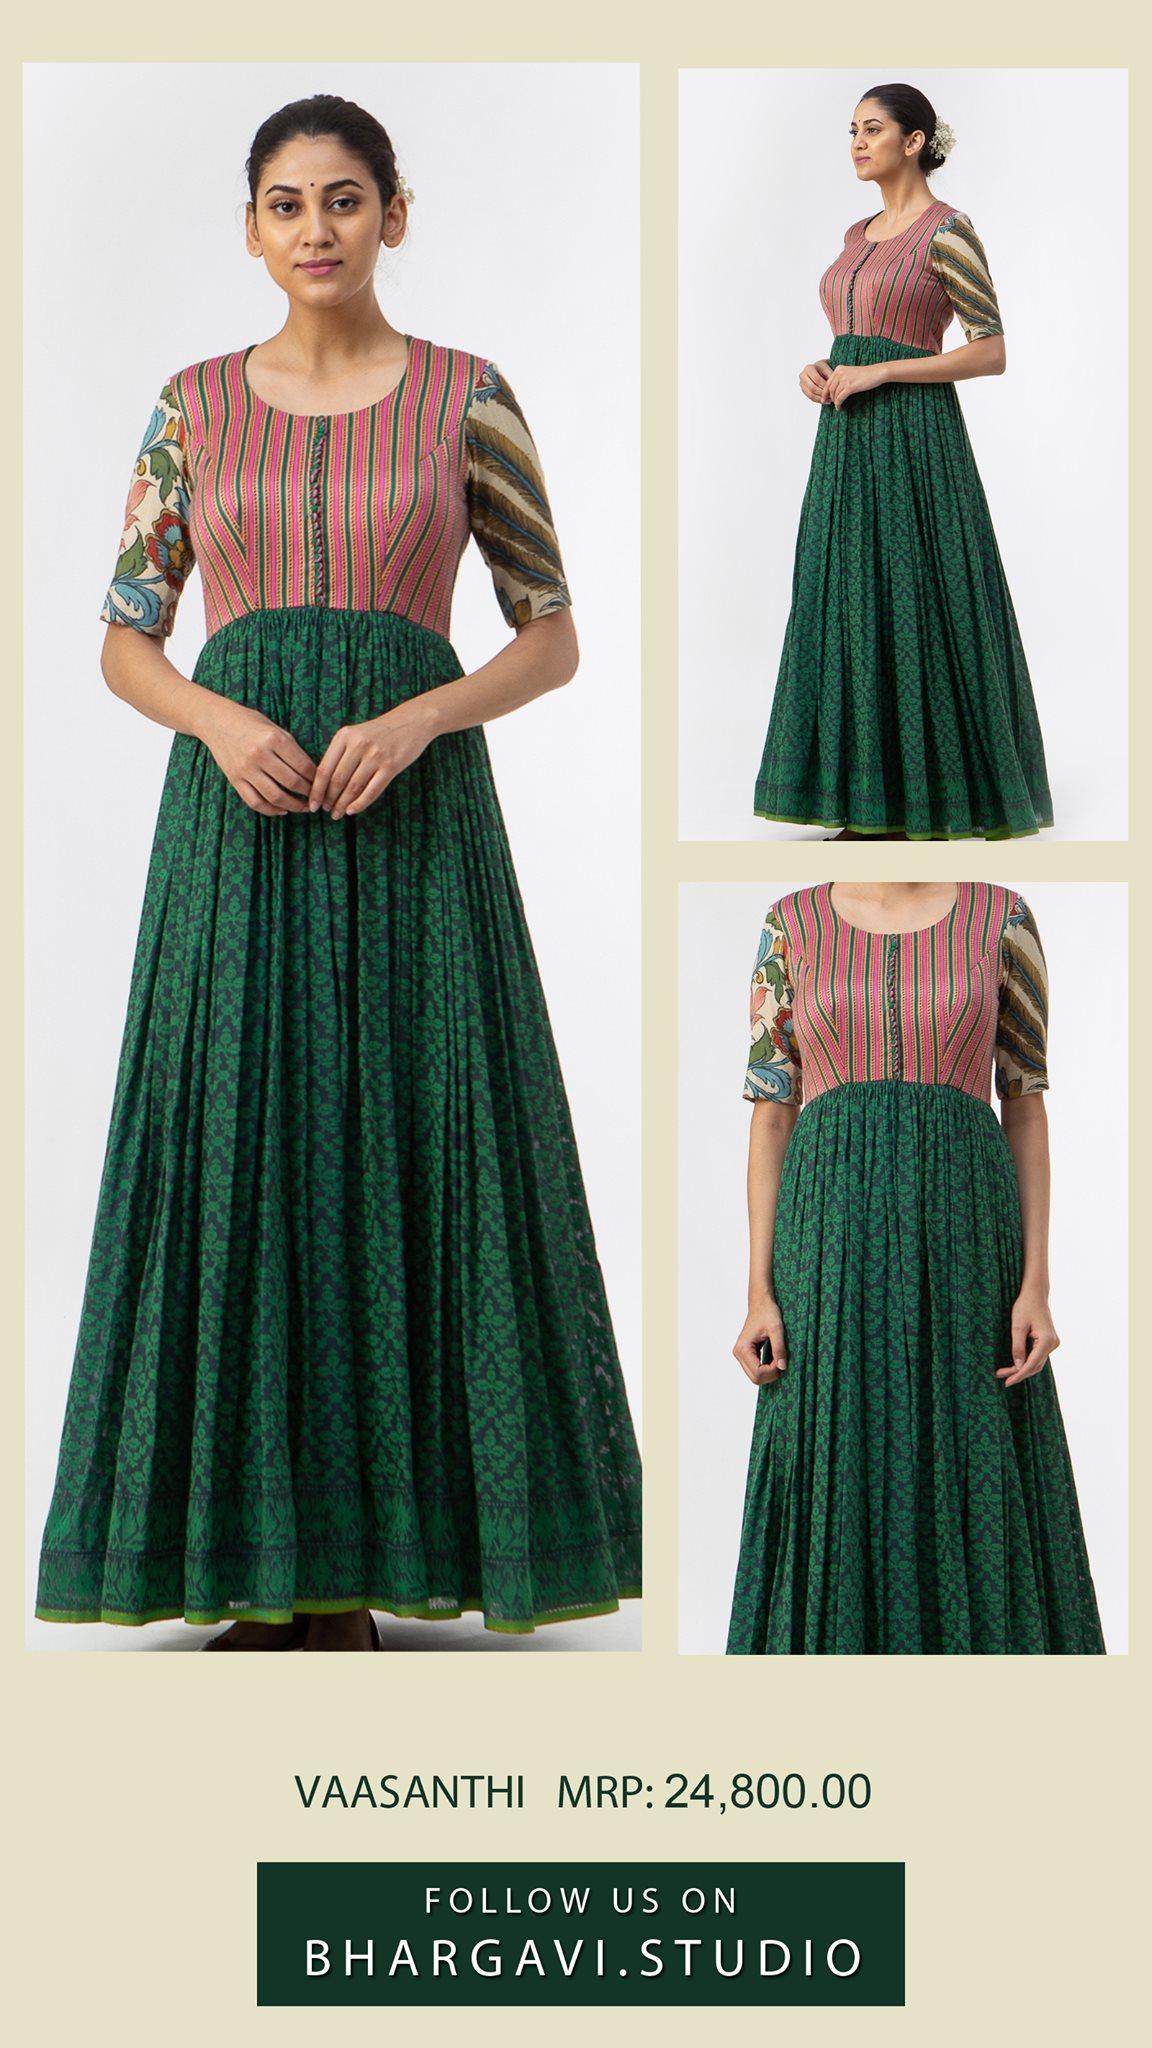 Beautiful green and pink color combination janmdani cotton benaras long frock. Price : 24800/- 2021-06-11